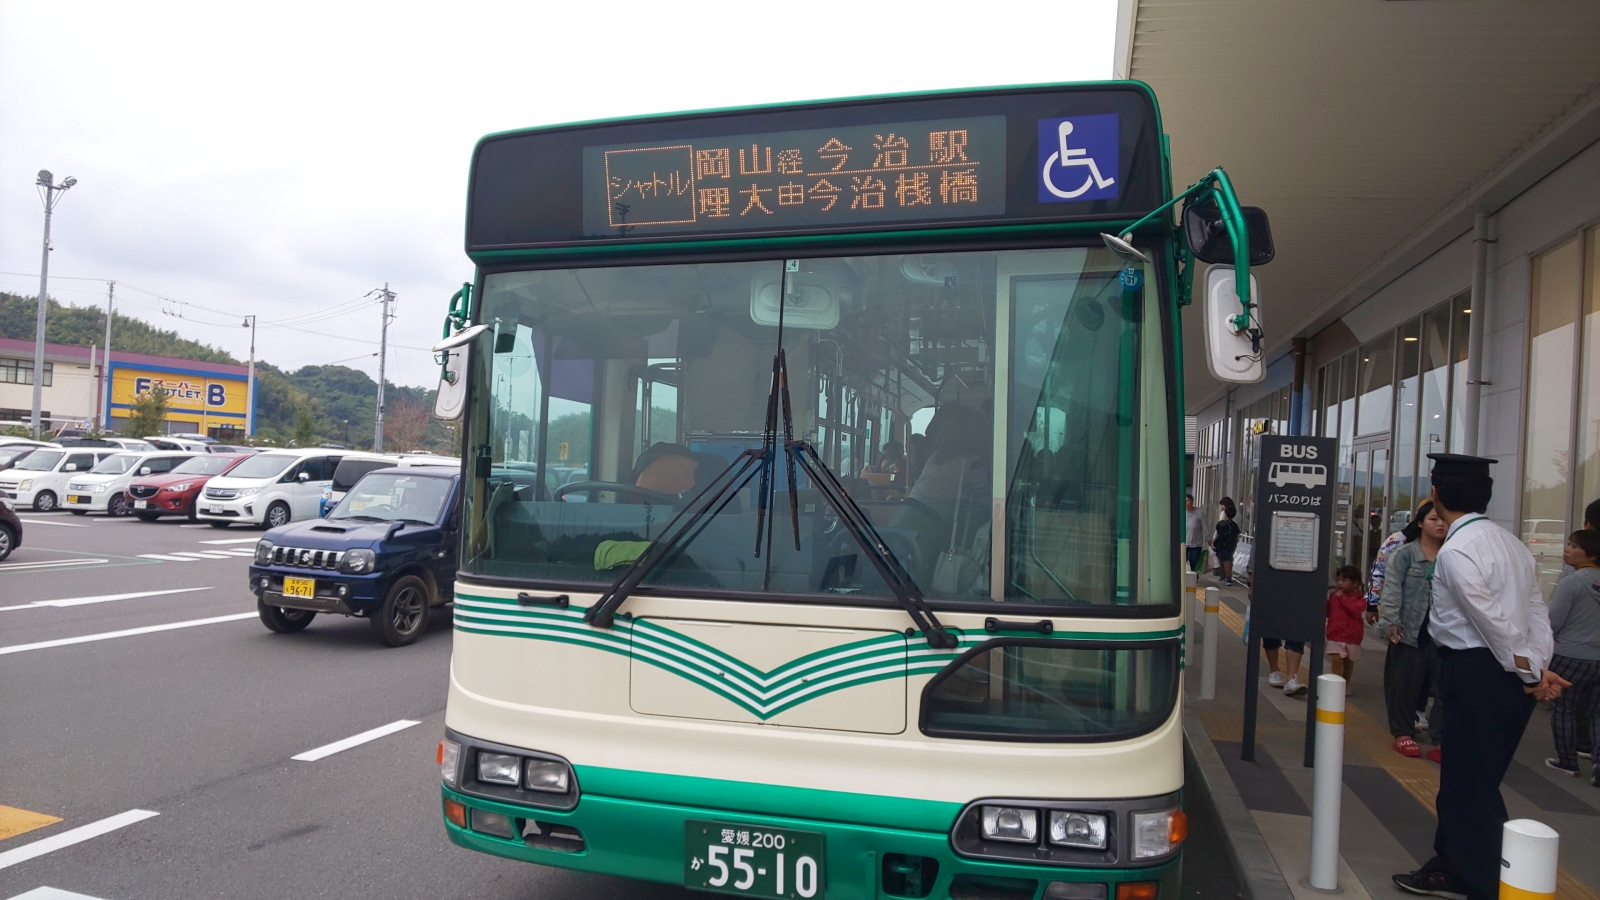 dsc_2301.jpg